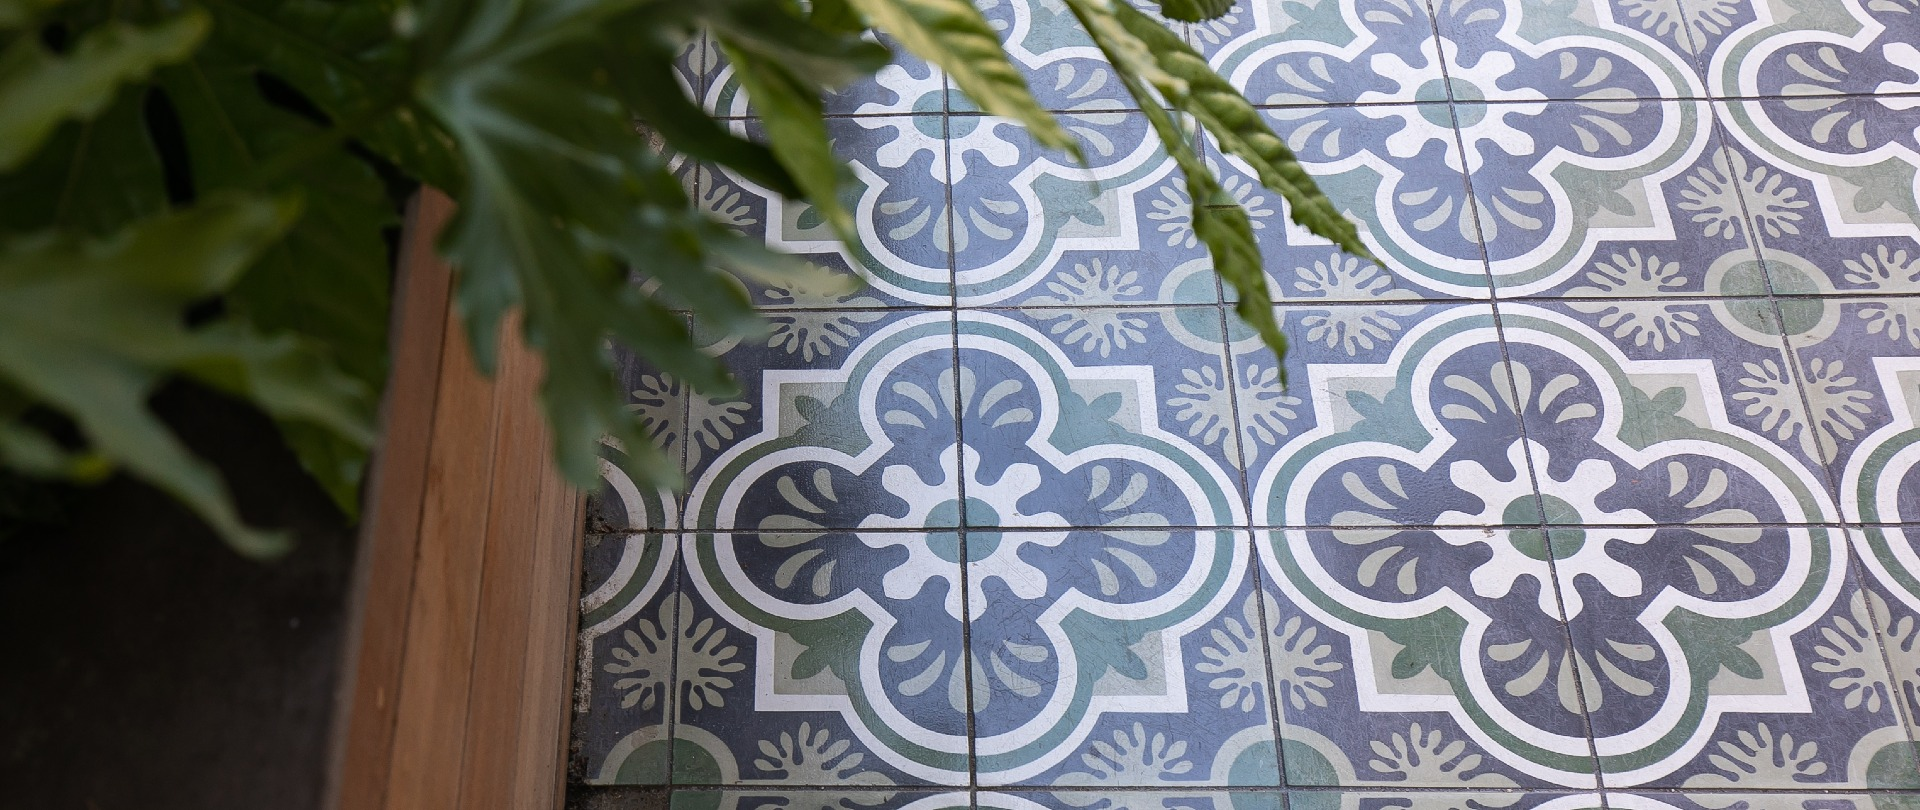 Create your own Joy with Custom Cement Tile! Design your own with our Tile Design Tool.